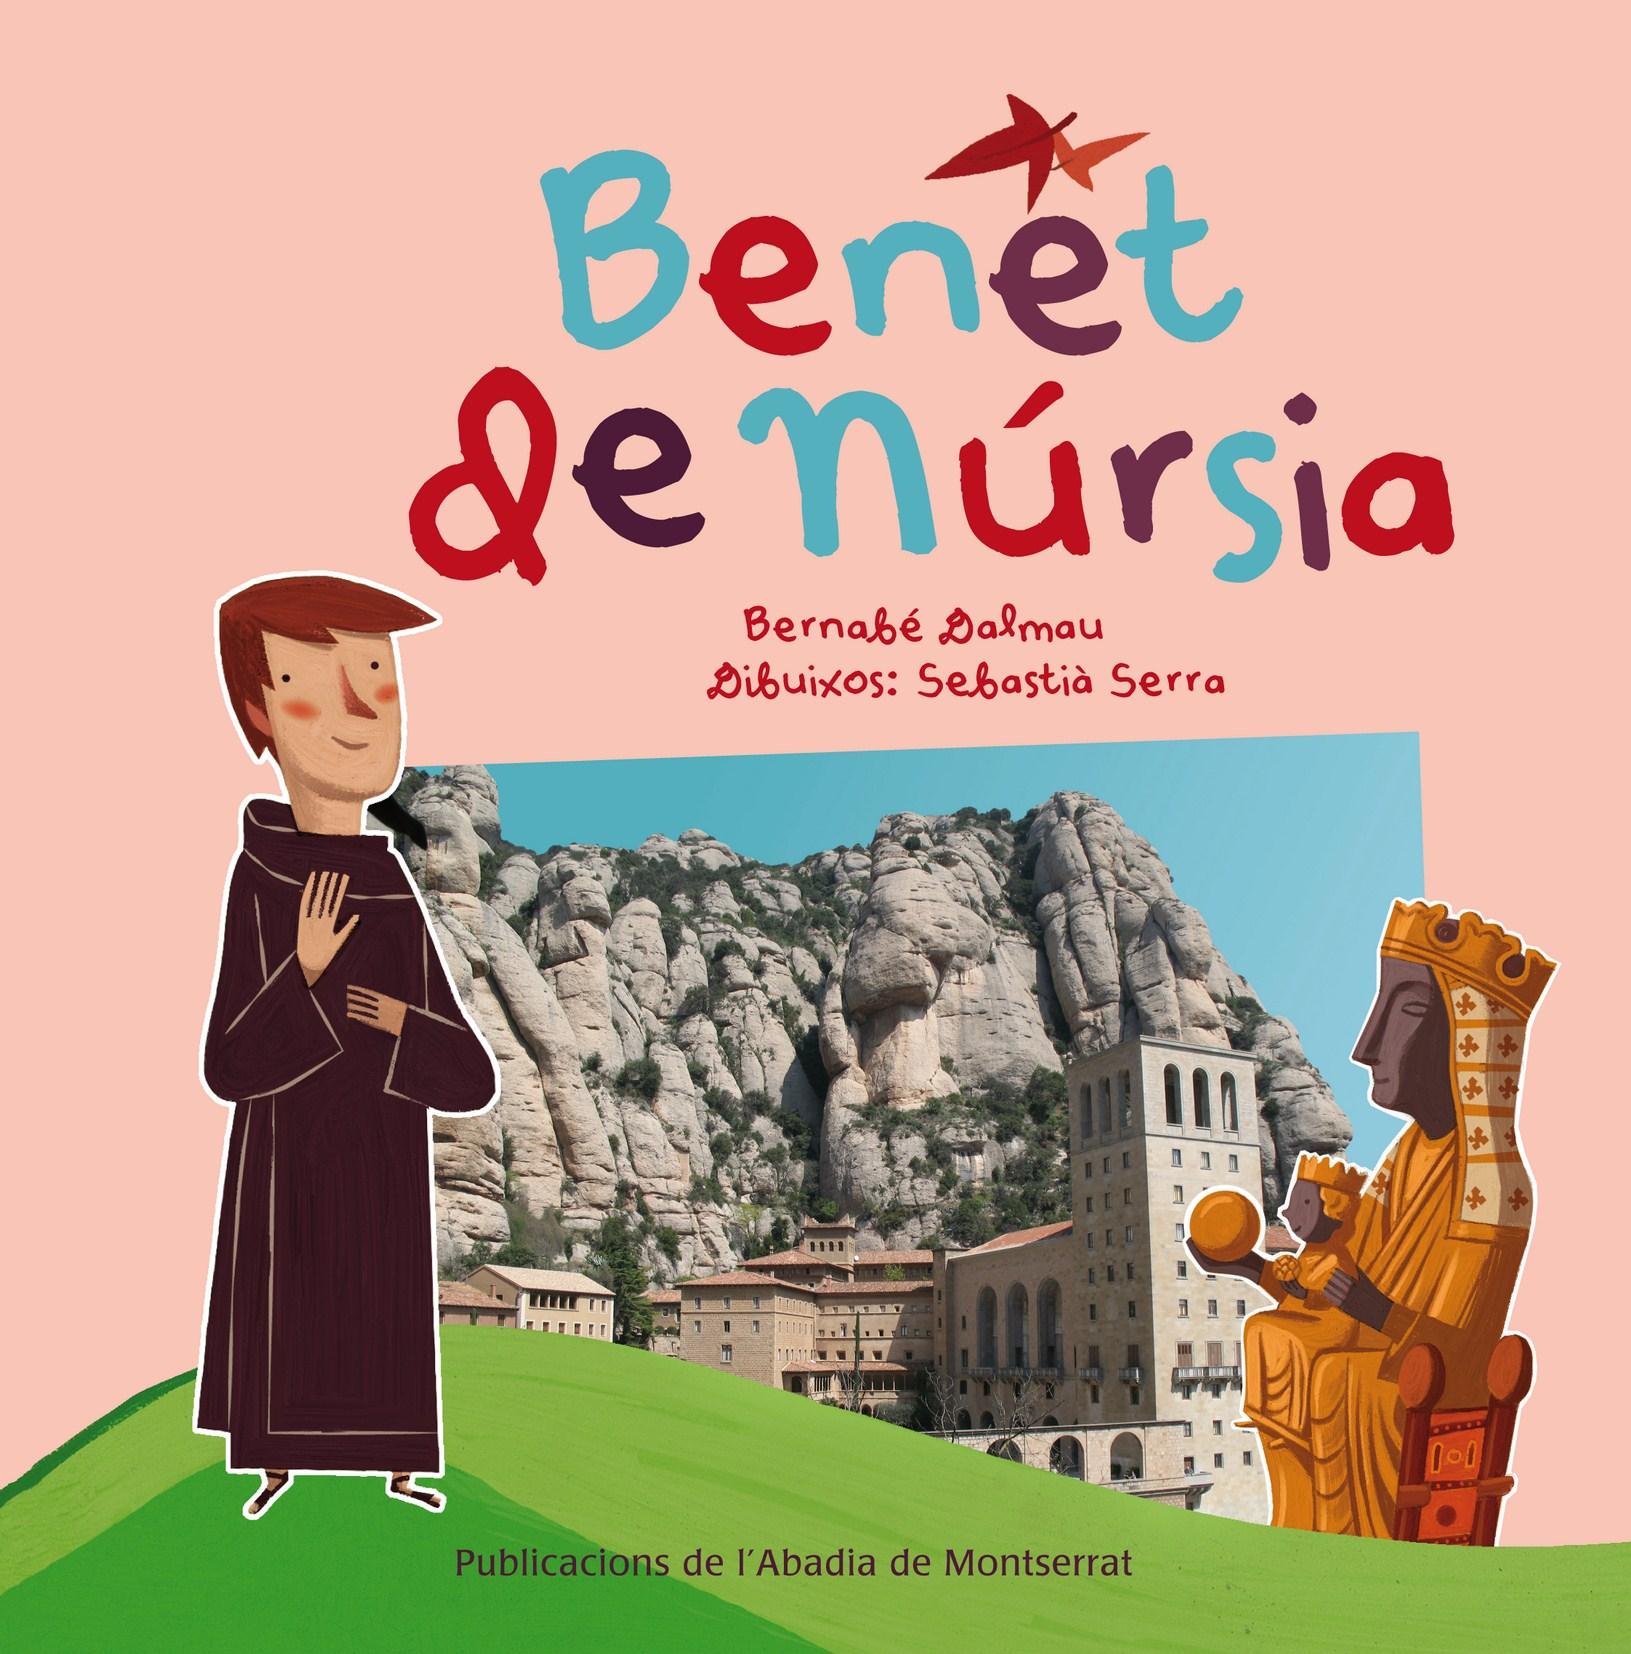 BENET DE NÚRSIA